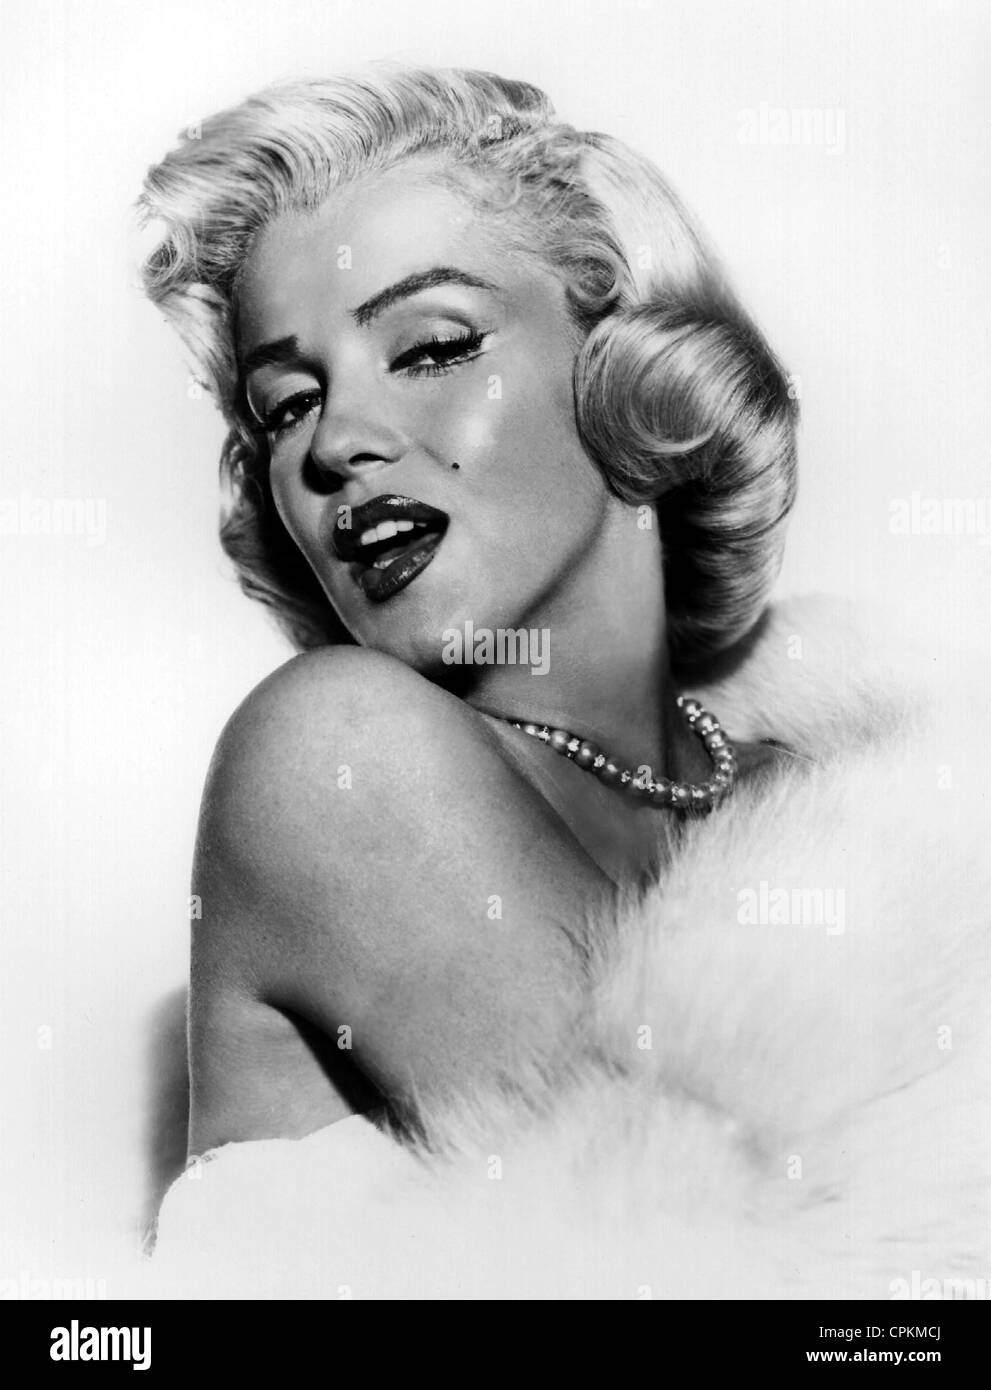 Farbe im Portrait der Filmstar Marilyn Monroe, abgebildet ...